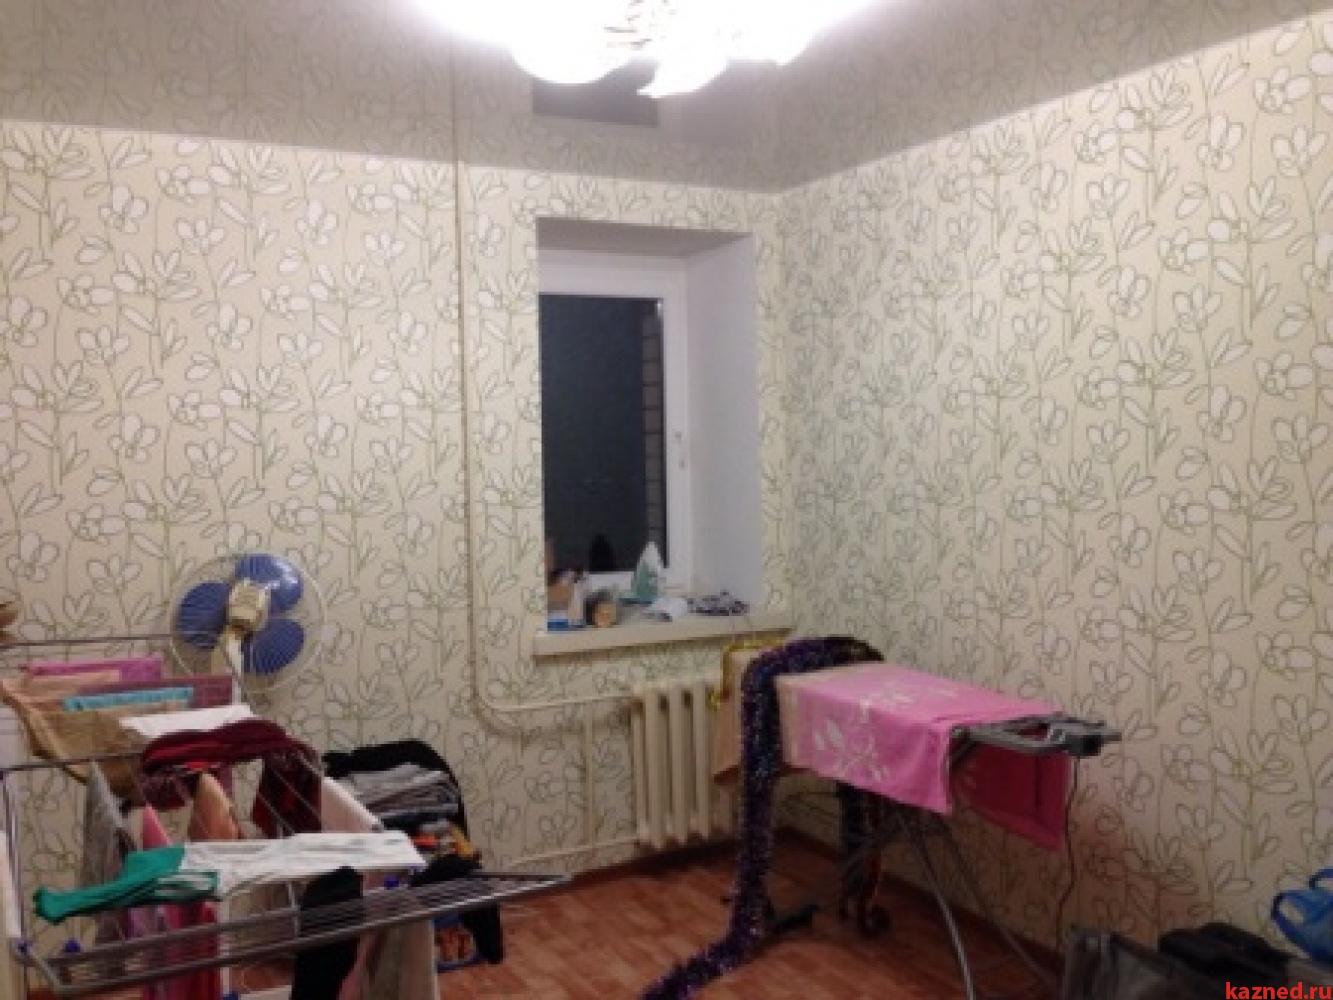 Продажа 4-к квартиры Баки Урманче, 10, 119 м2  (миниатюра №5)